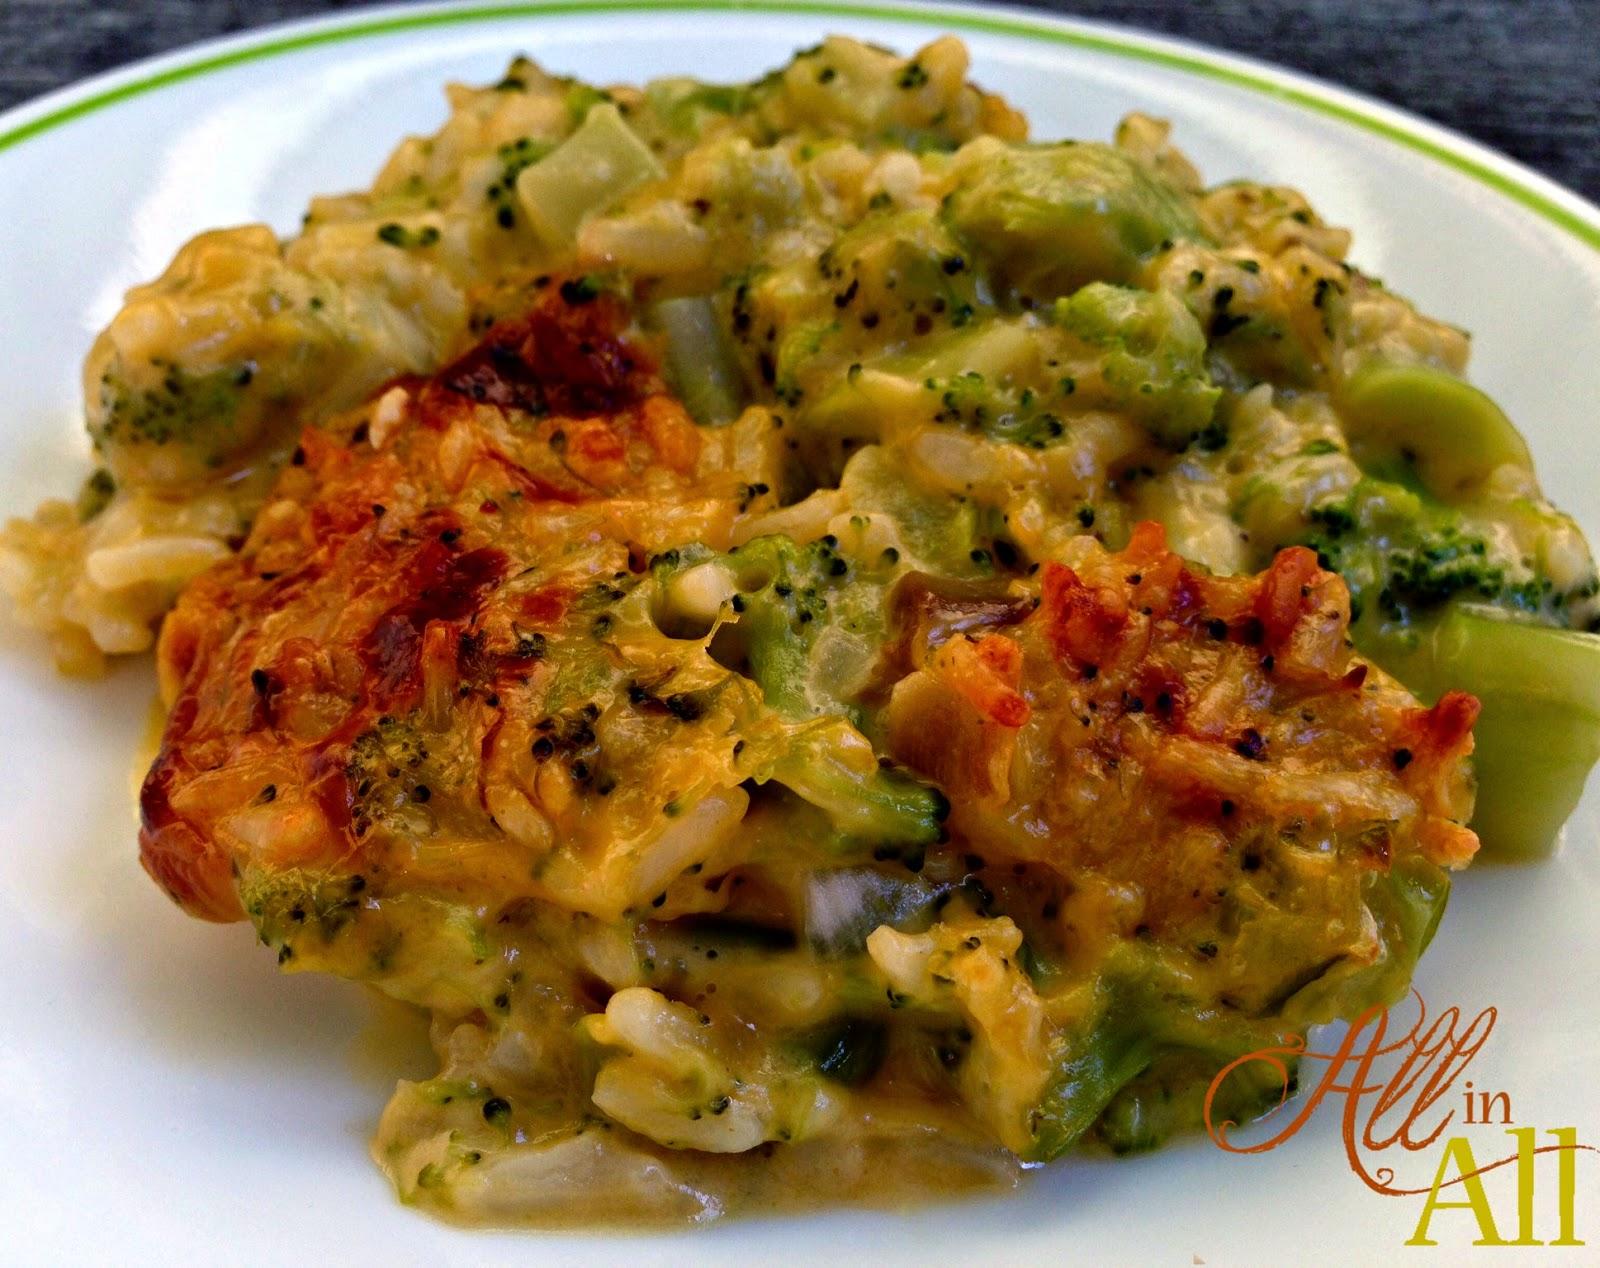 and rice casserole mexican rice casserole broccoli rice casserole ...